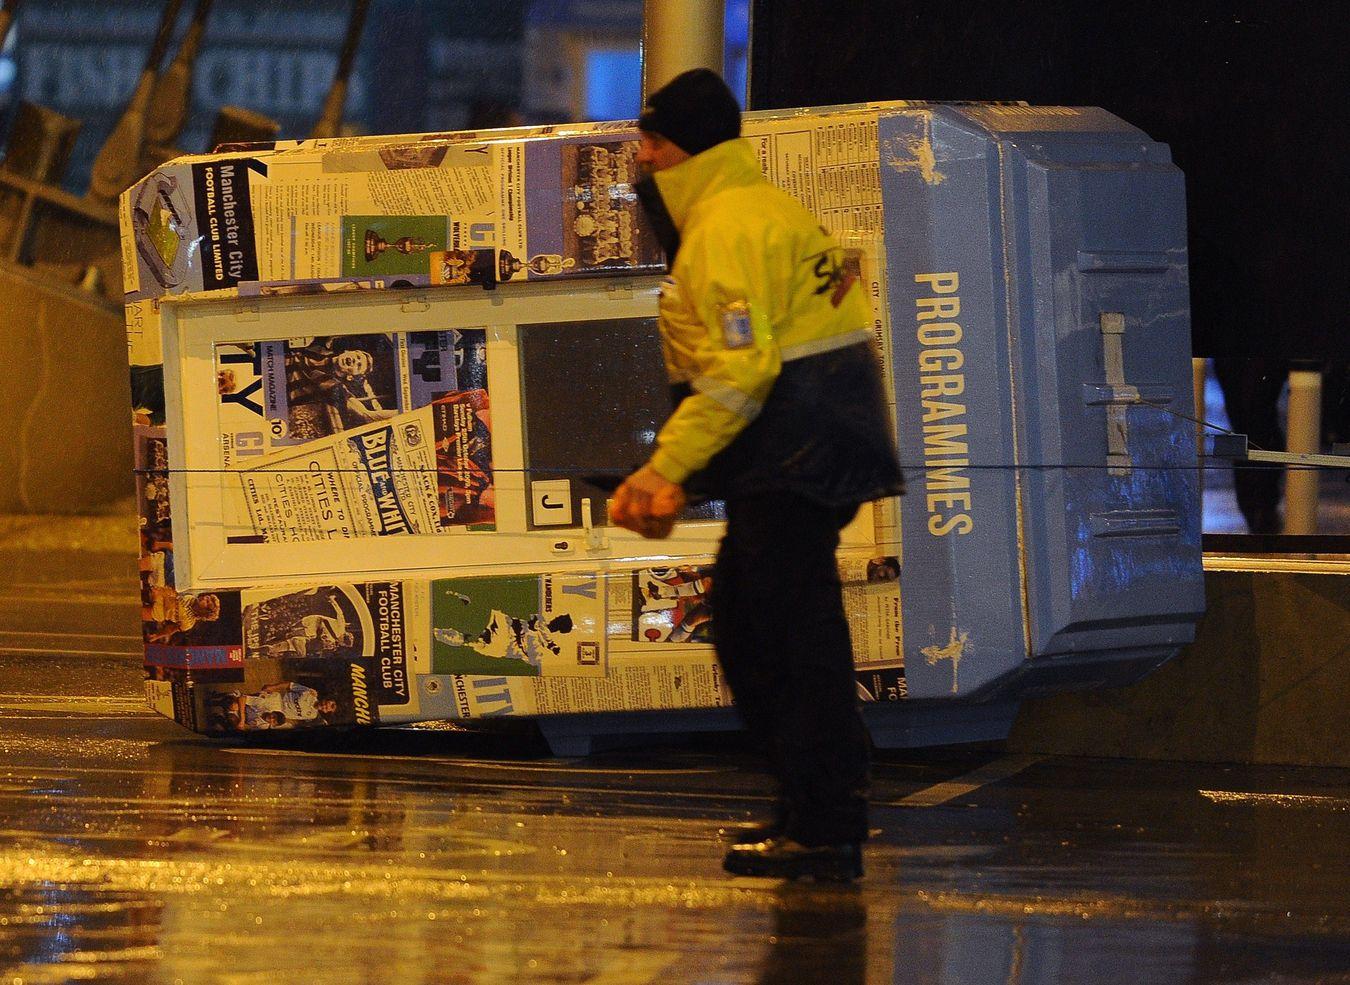 Man City v Sunderland 2014 postponement; blown-over programme seller's booth